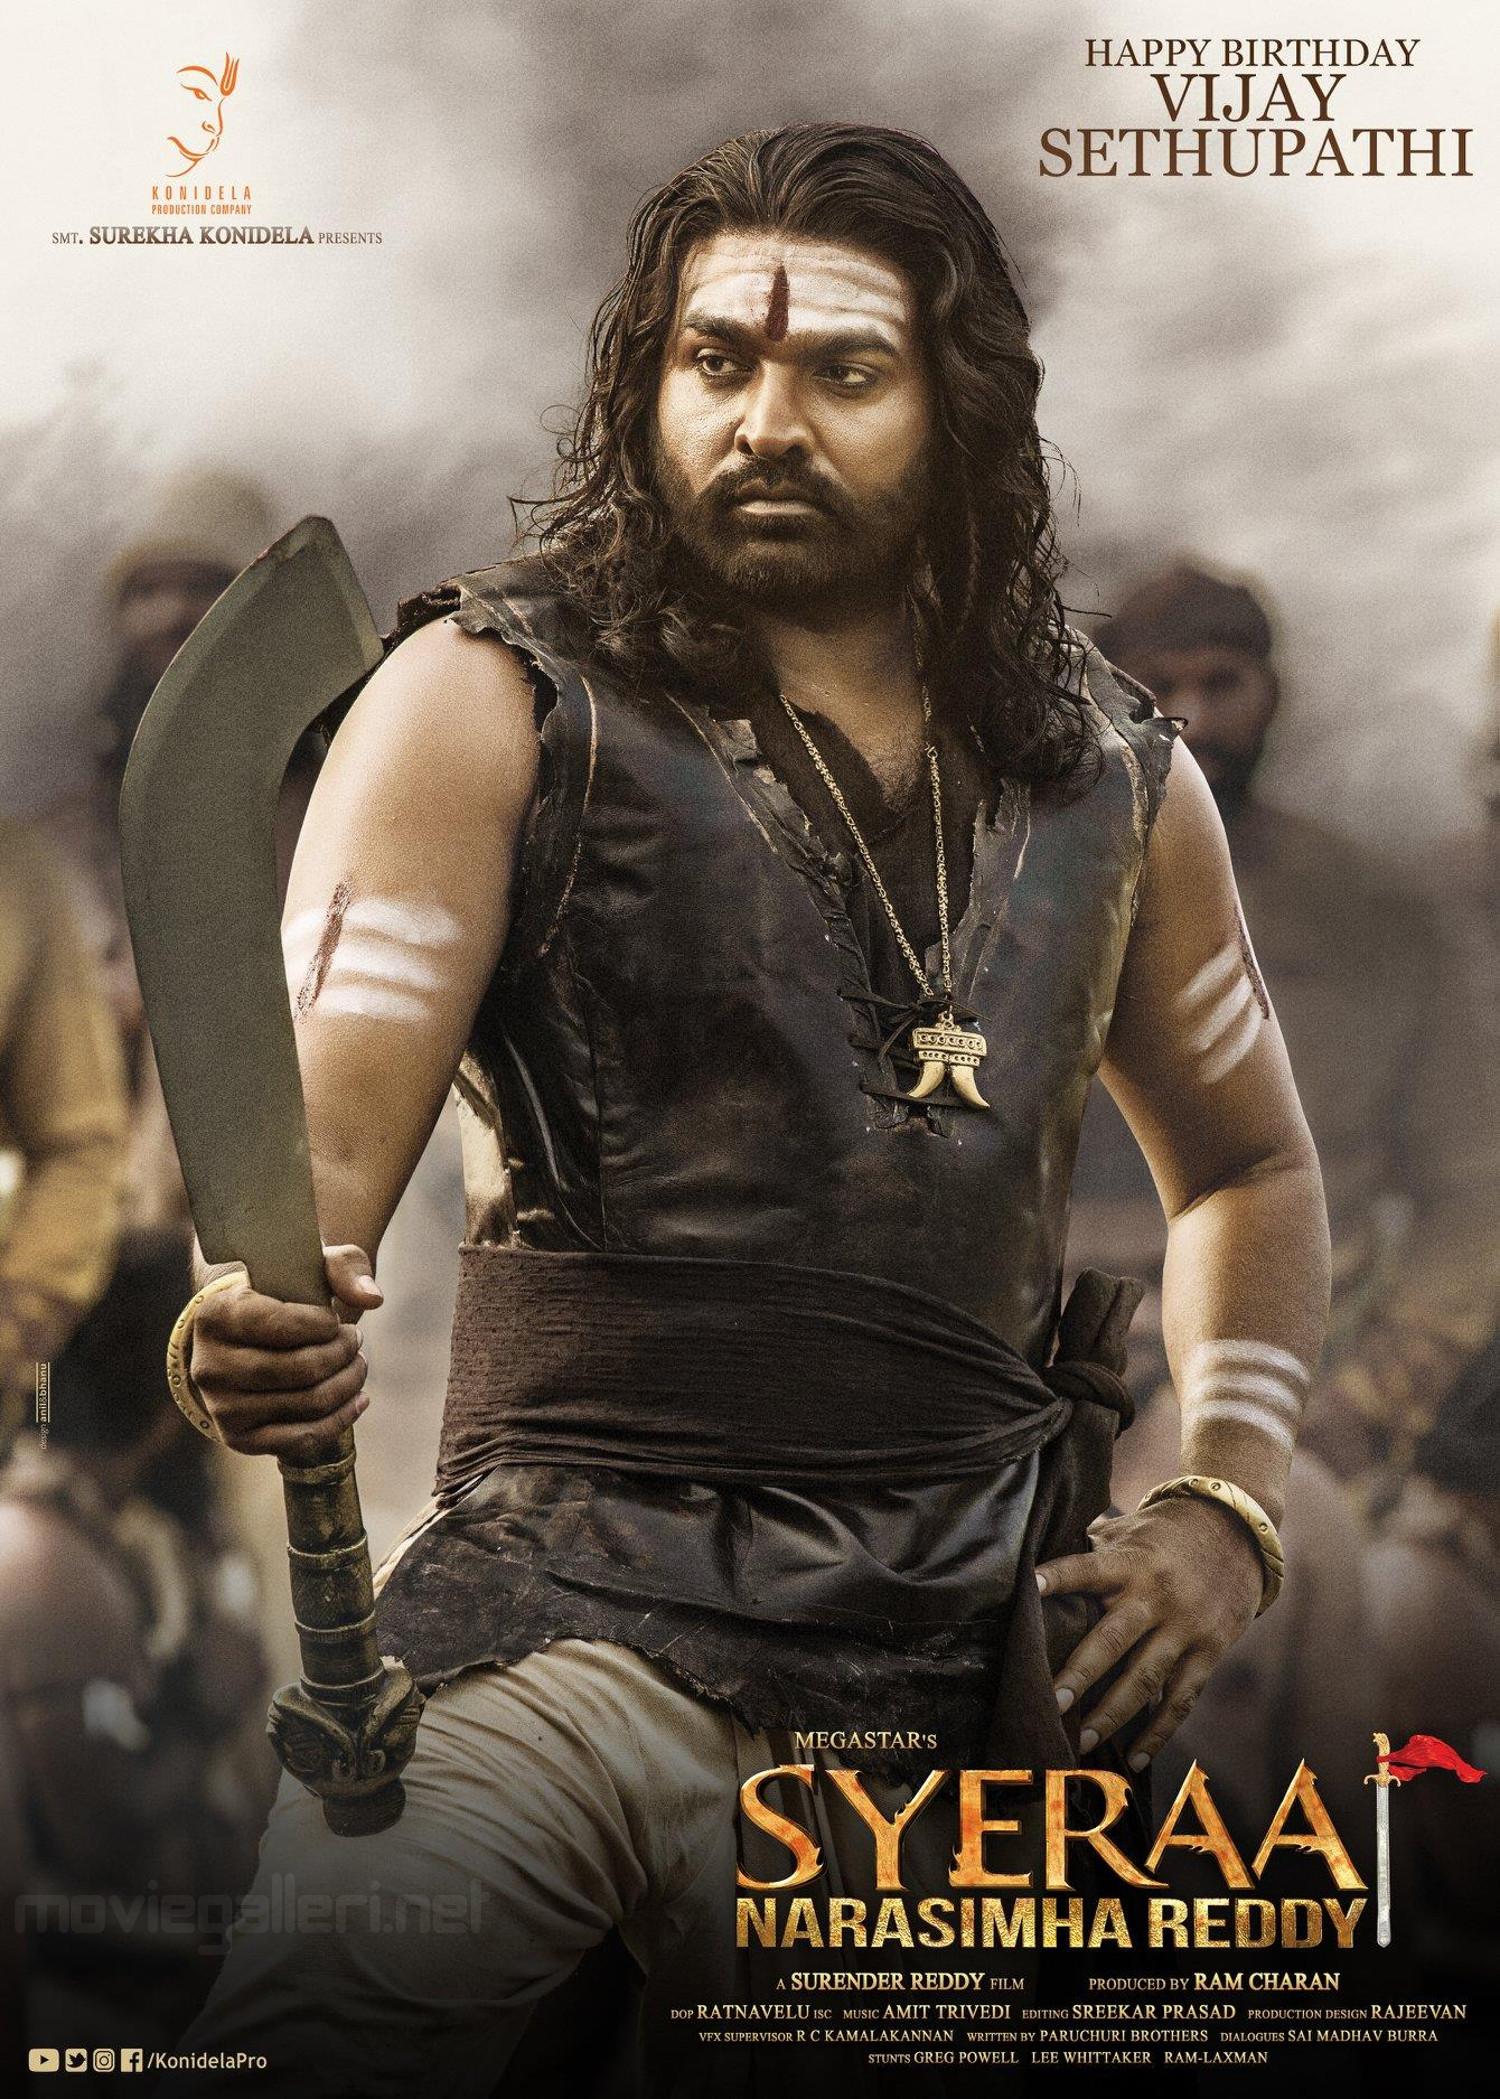 Actor Vijay Sethupathi as Raaja Paandi in Sye Raa NaraSimha Reddy HD Poster